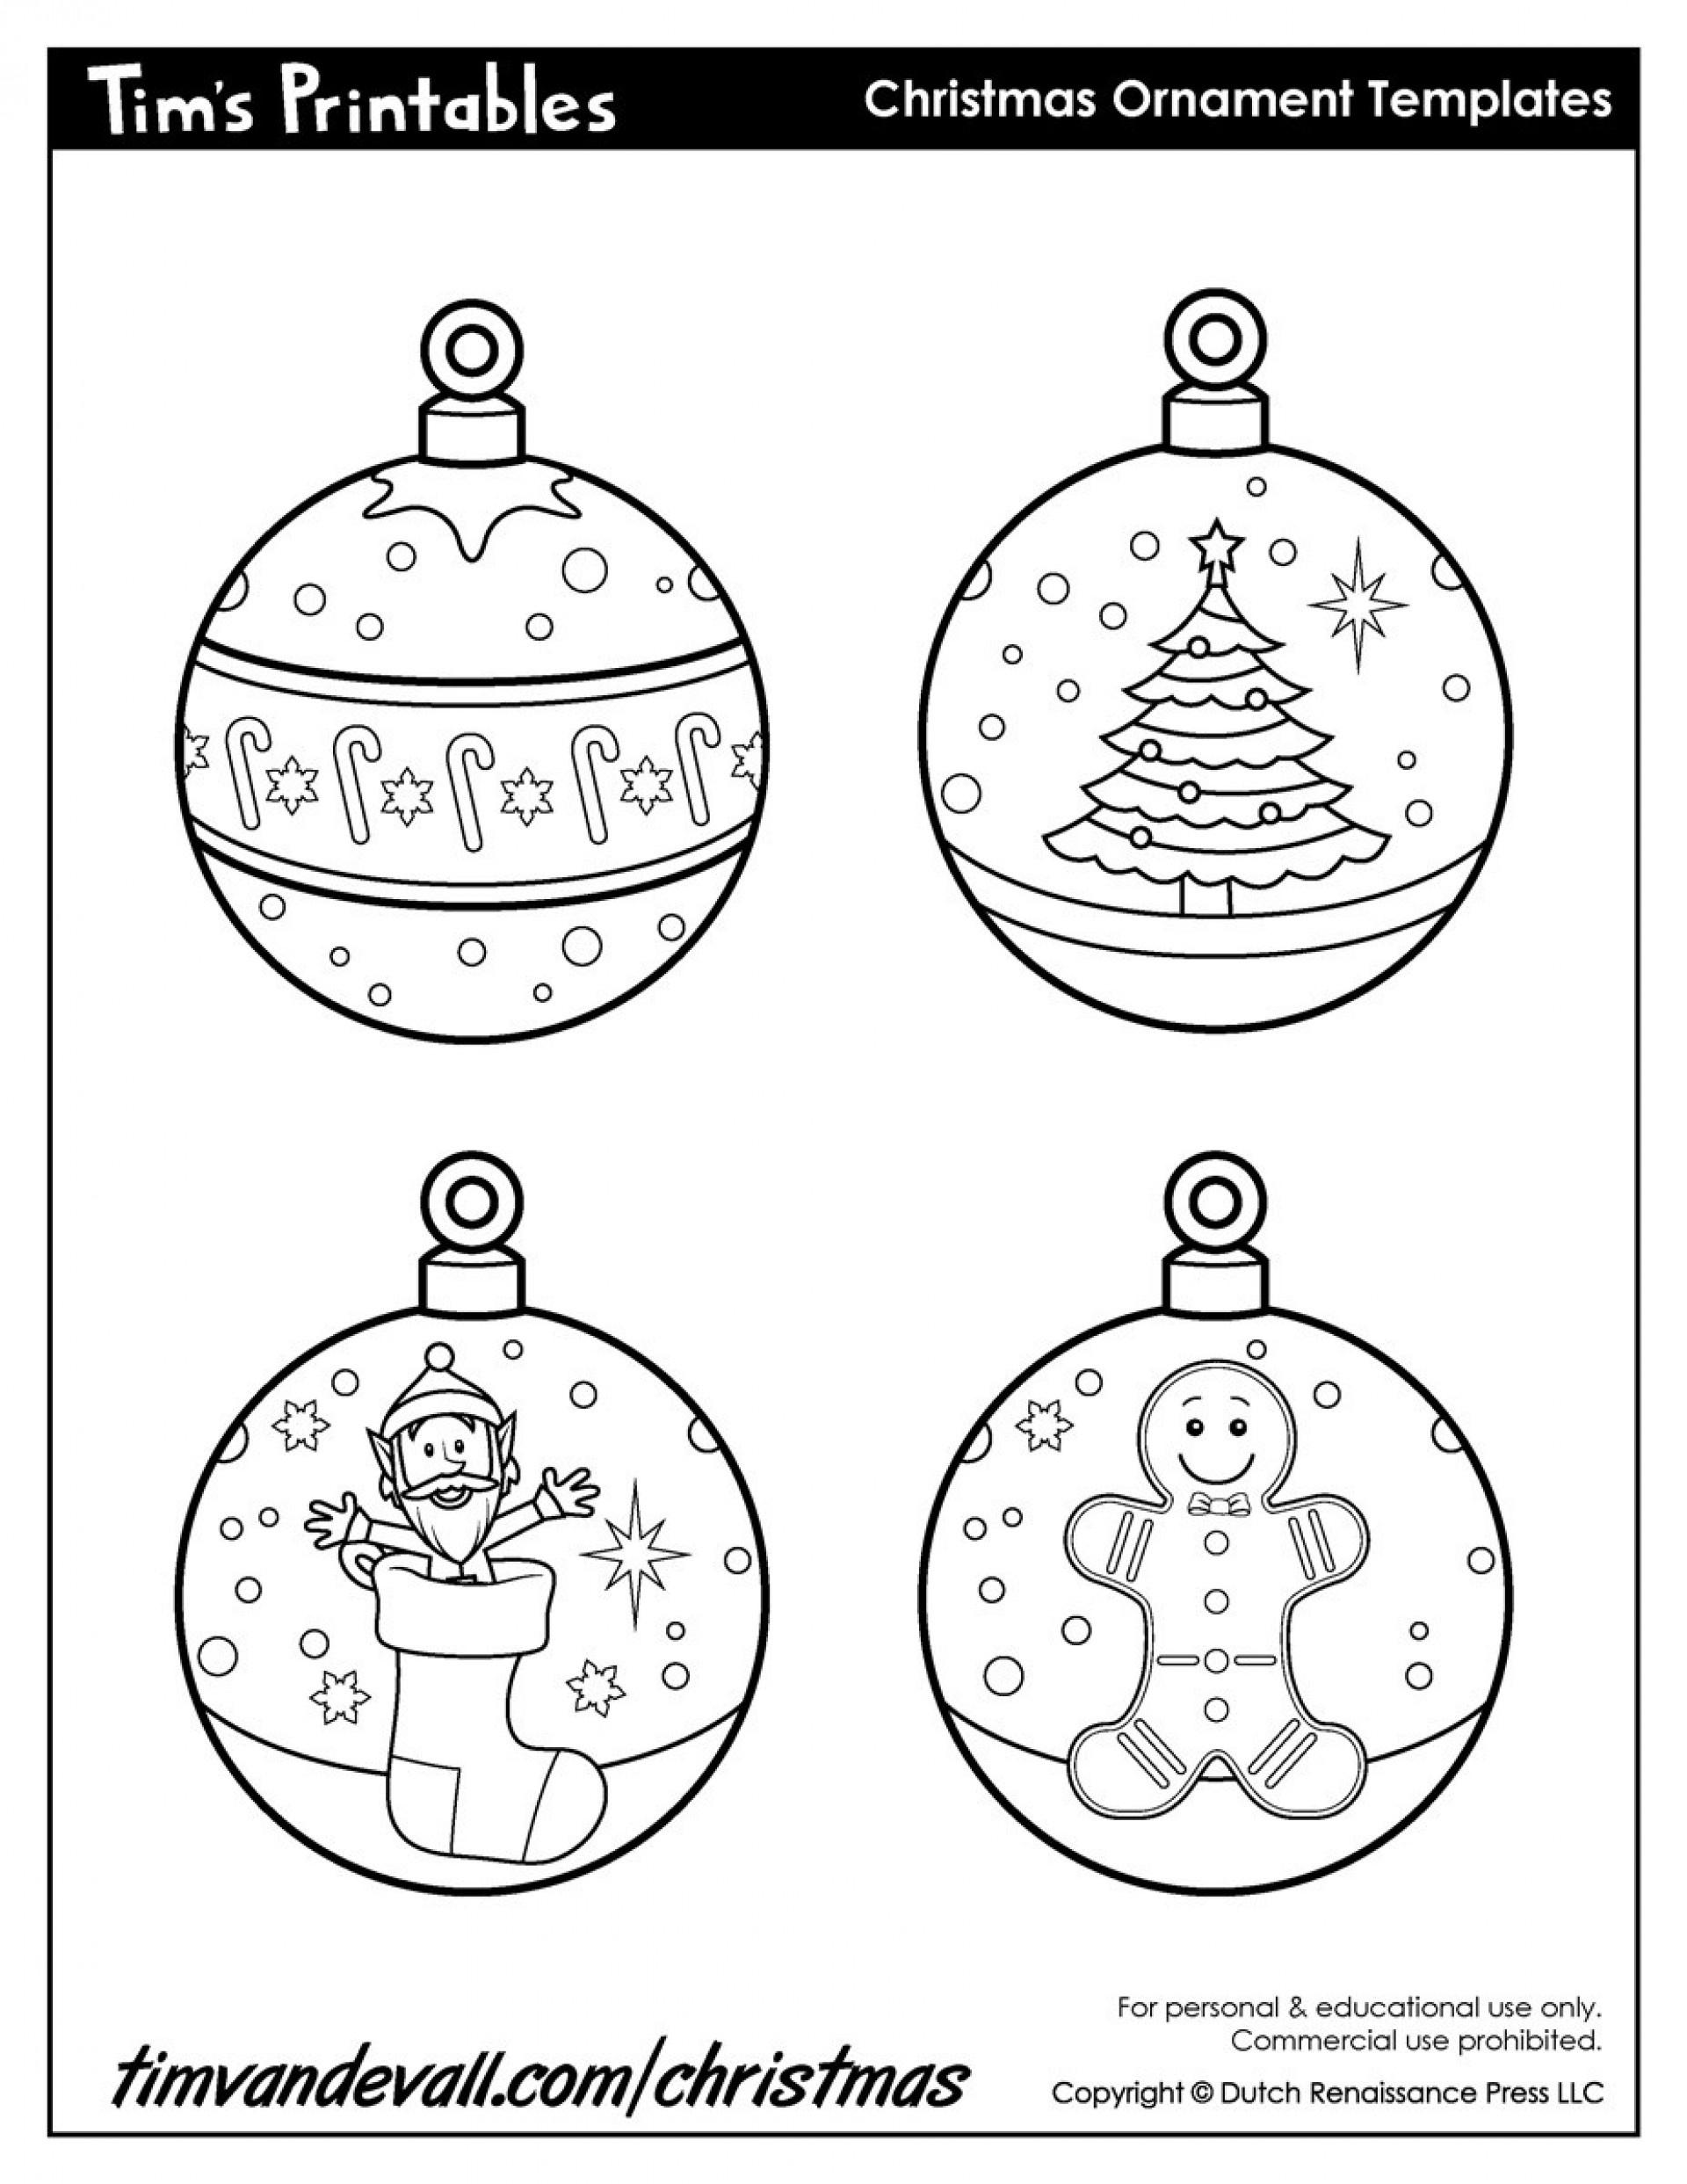 005 Printable Christmas Ornament Templates Paper Ornamentsssl1 - Free Printable Christmas Ornament Patterns